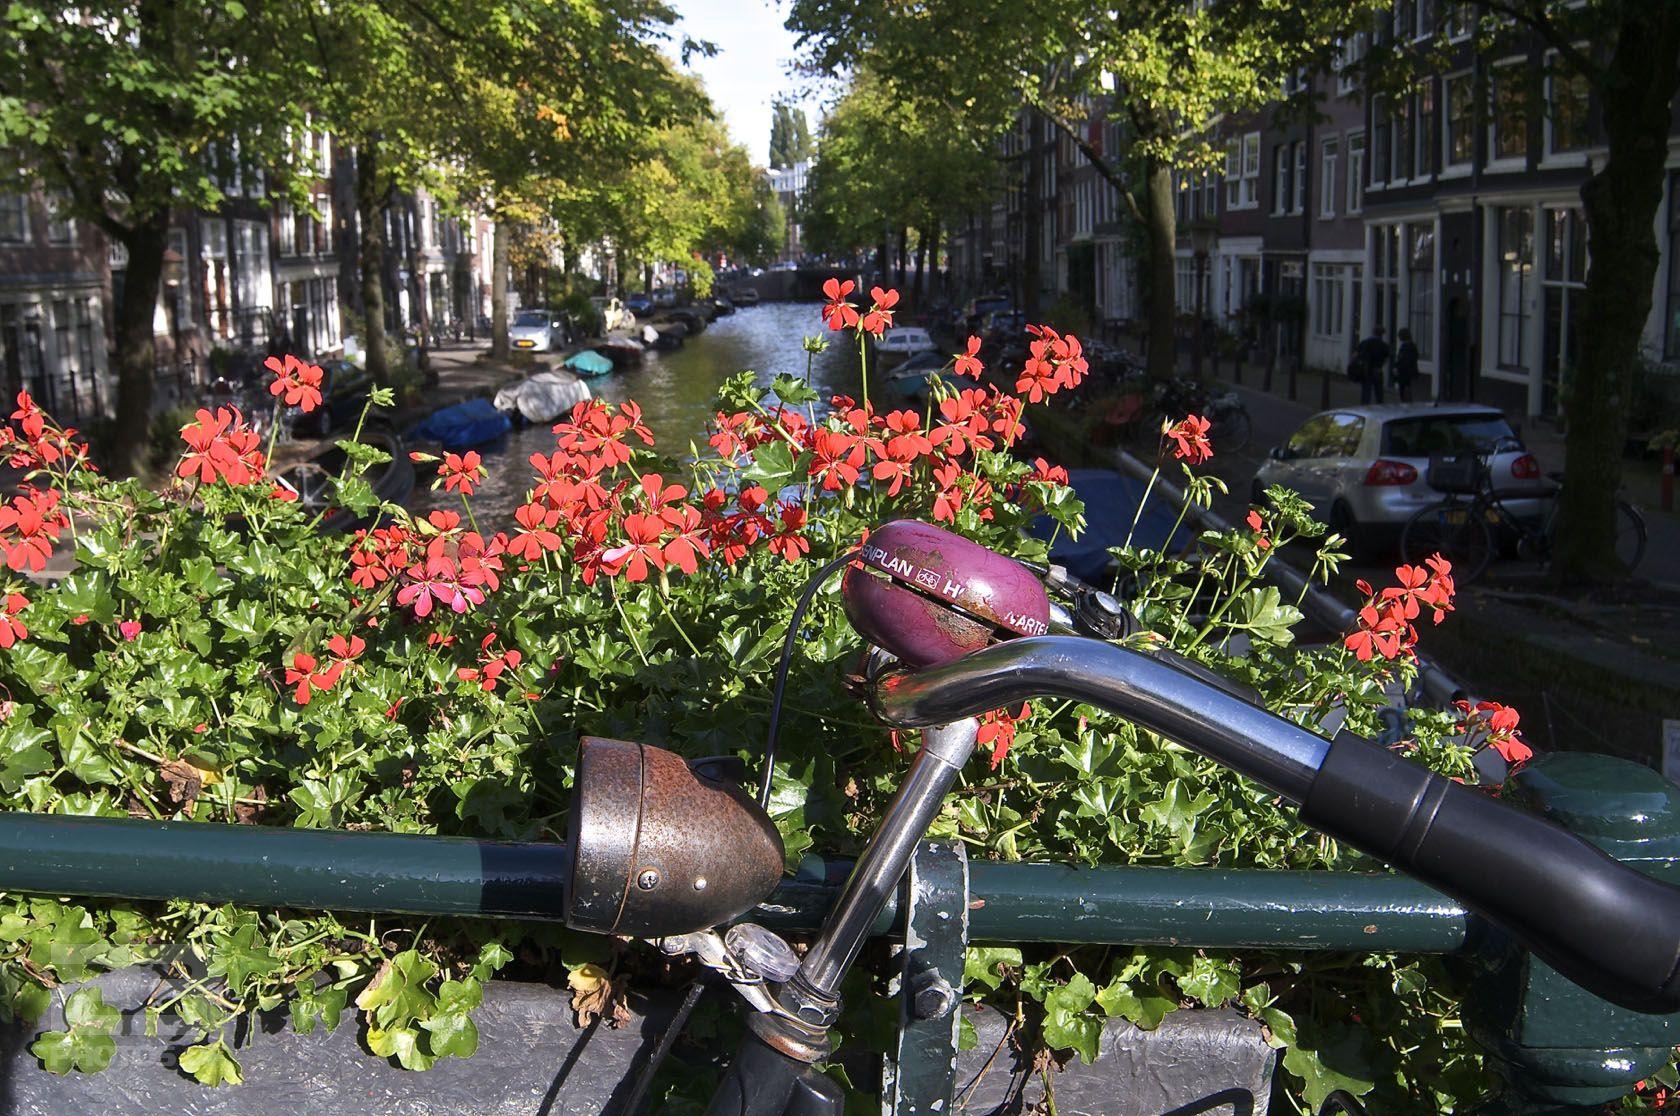 Bikes and Flowers Egelantiersgracht photo | 23 Photos Of Amsterdam